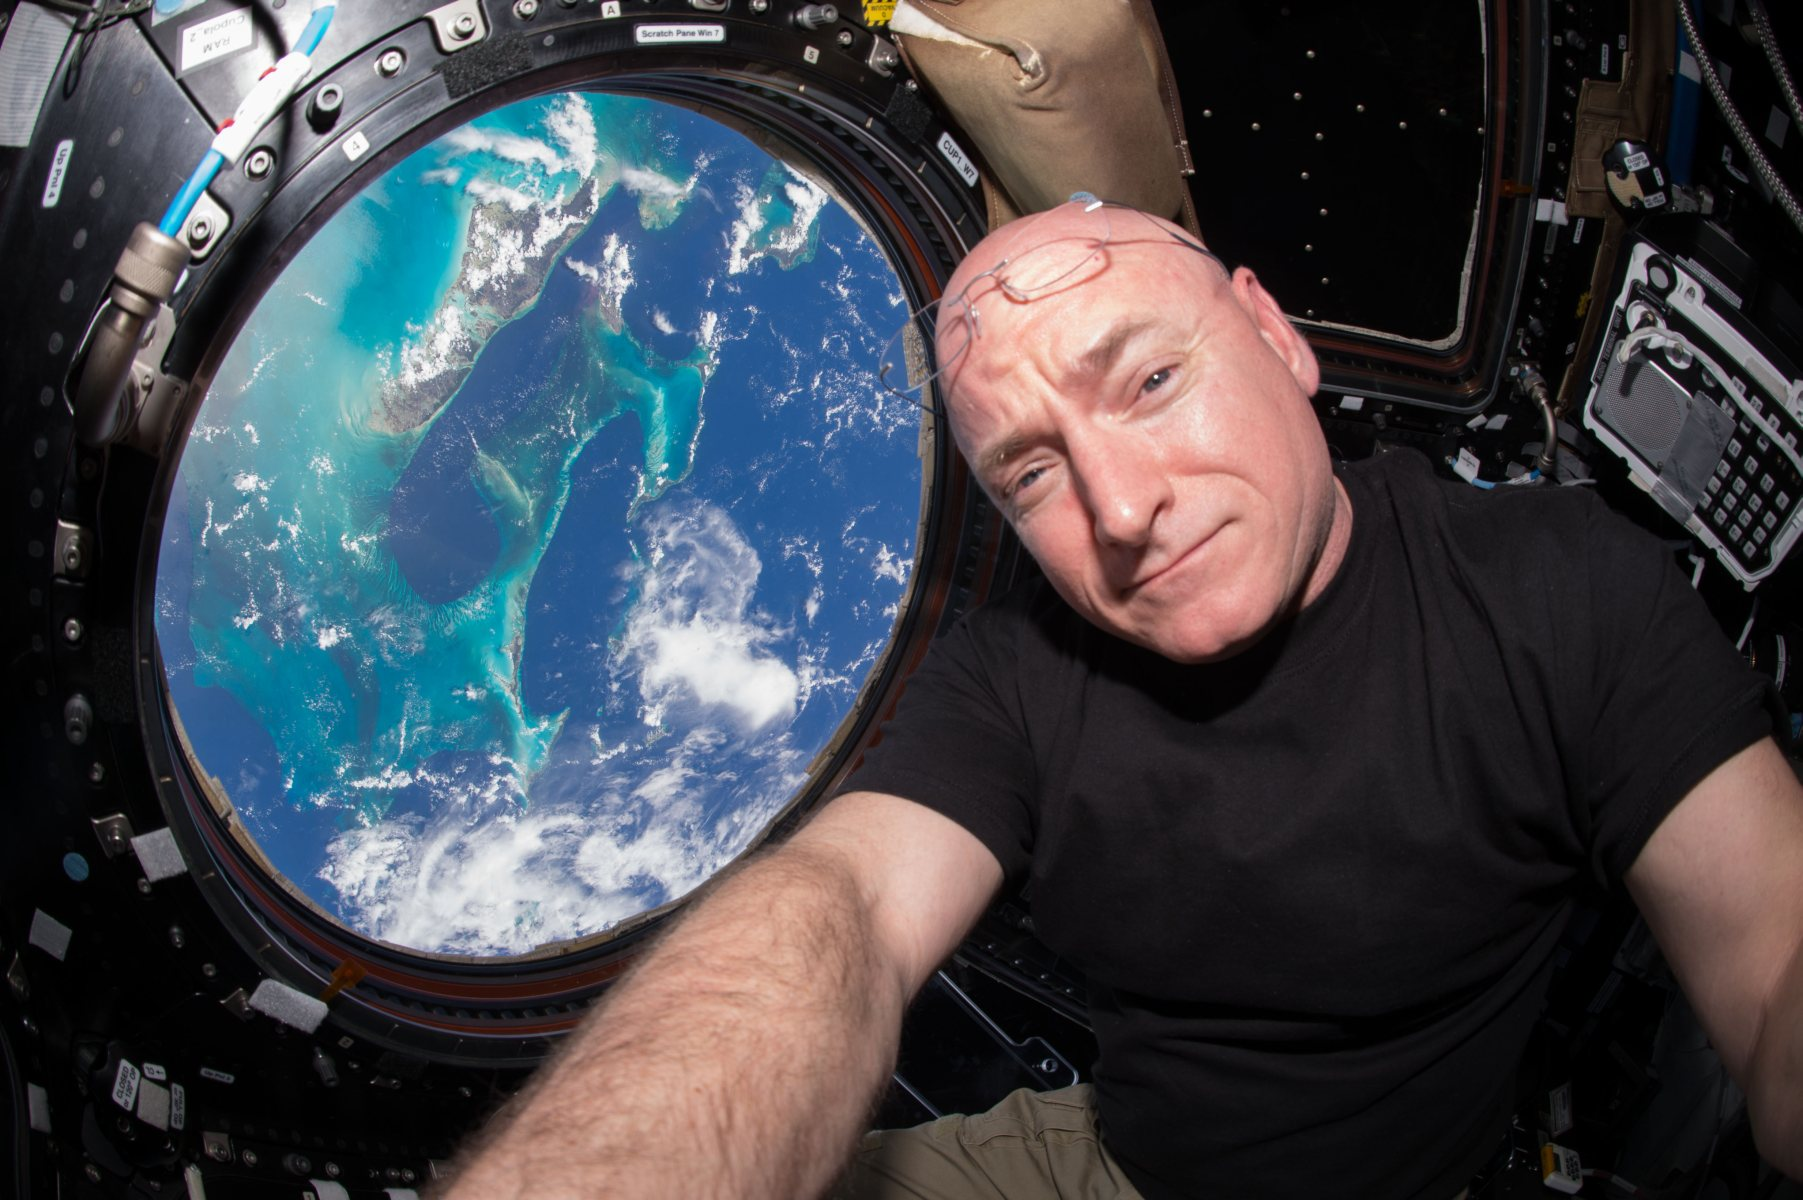 Rok w kosmosie